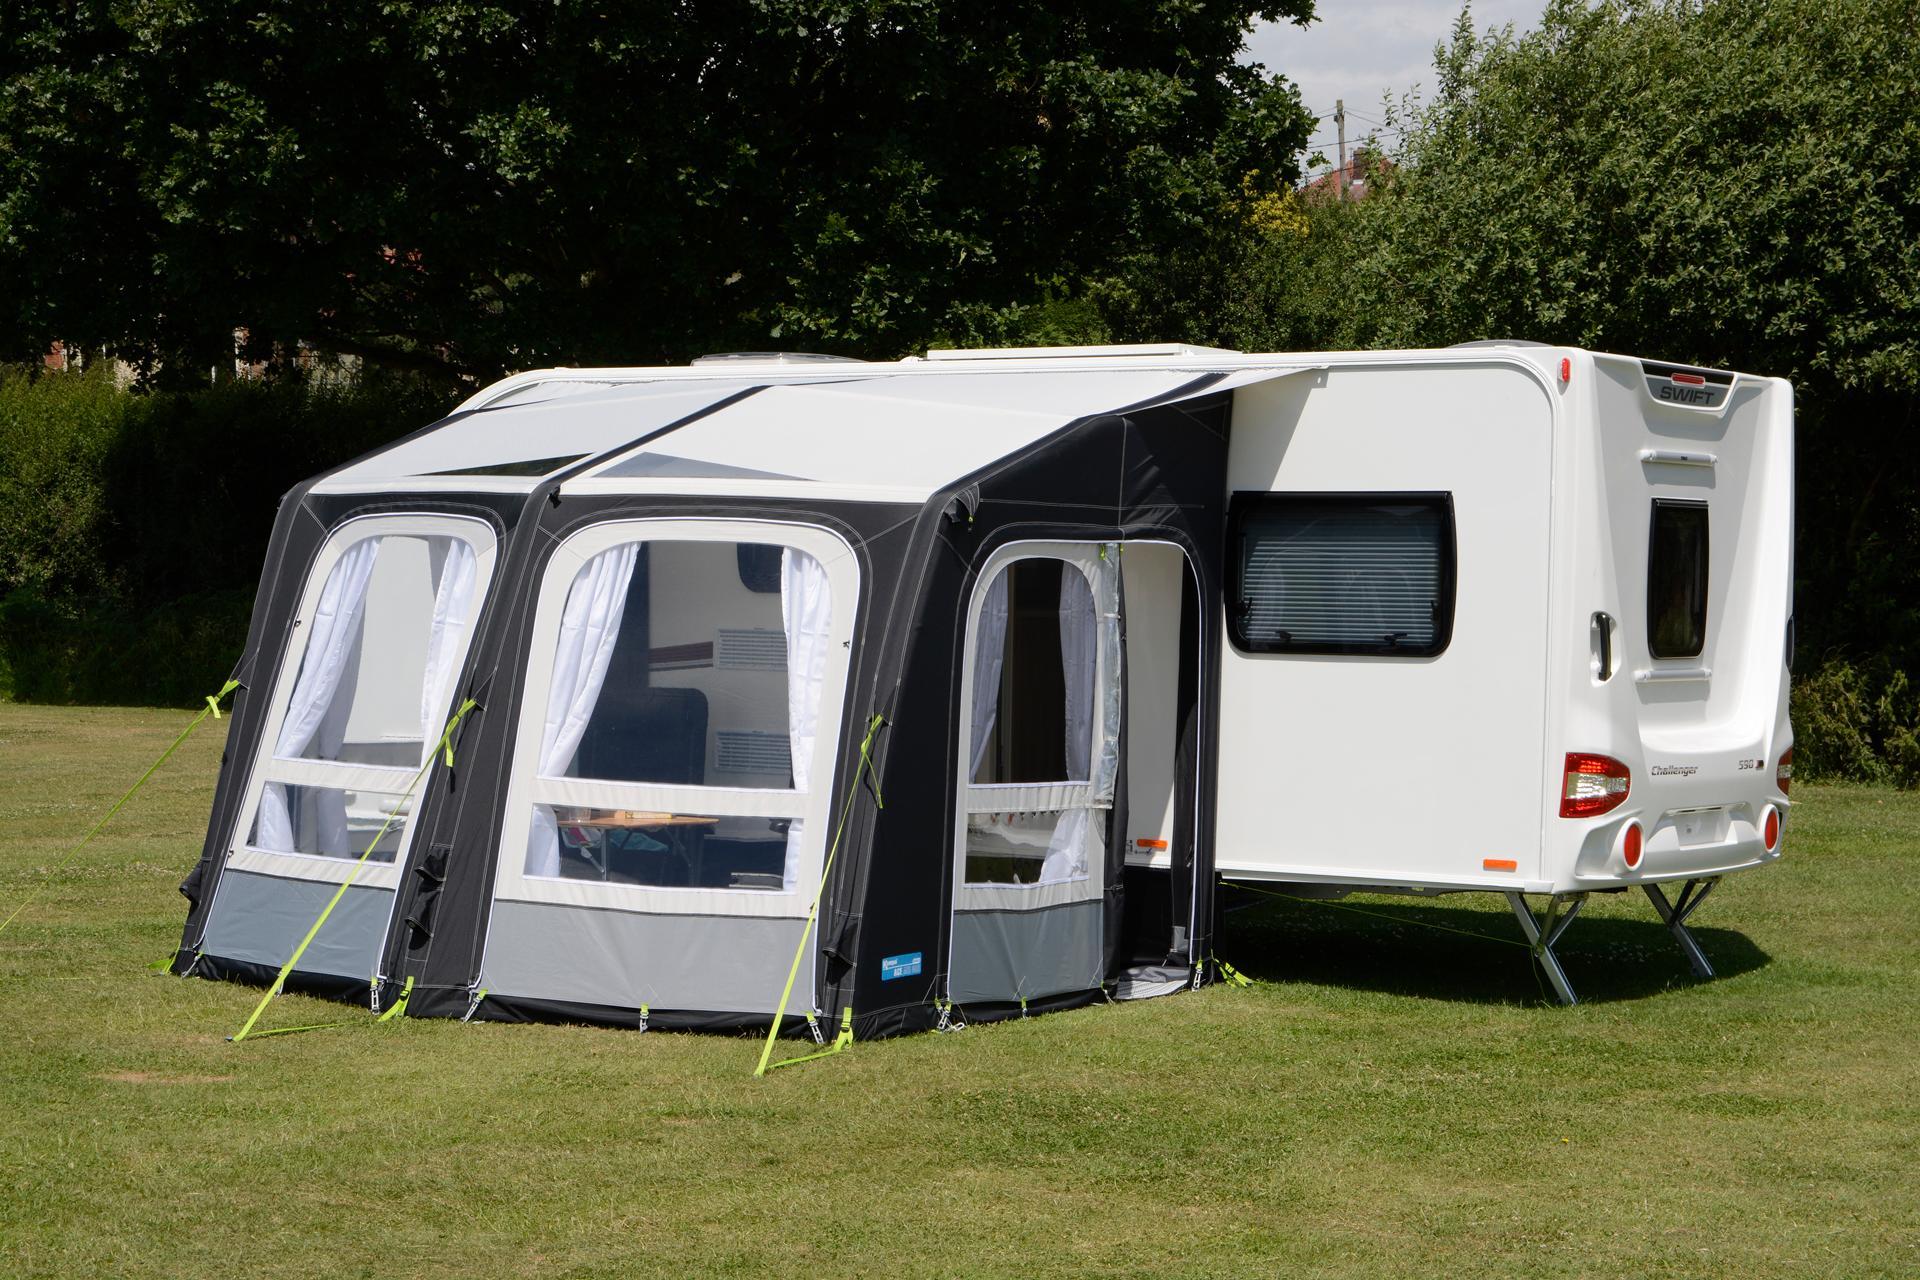 kampa ace air 300 vorzelt 300x300cm von kampa bei camping. Black Bedroom Furniture Sets. Home Design Ideas